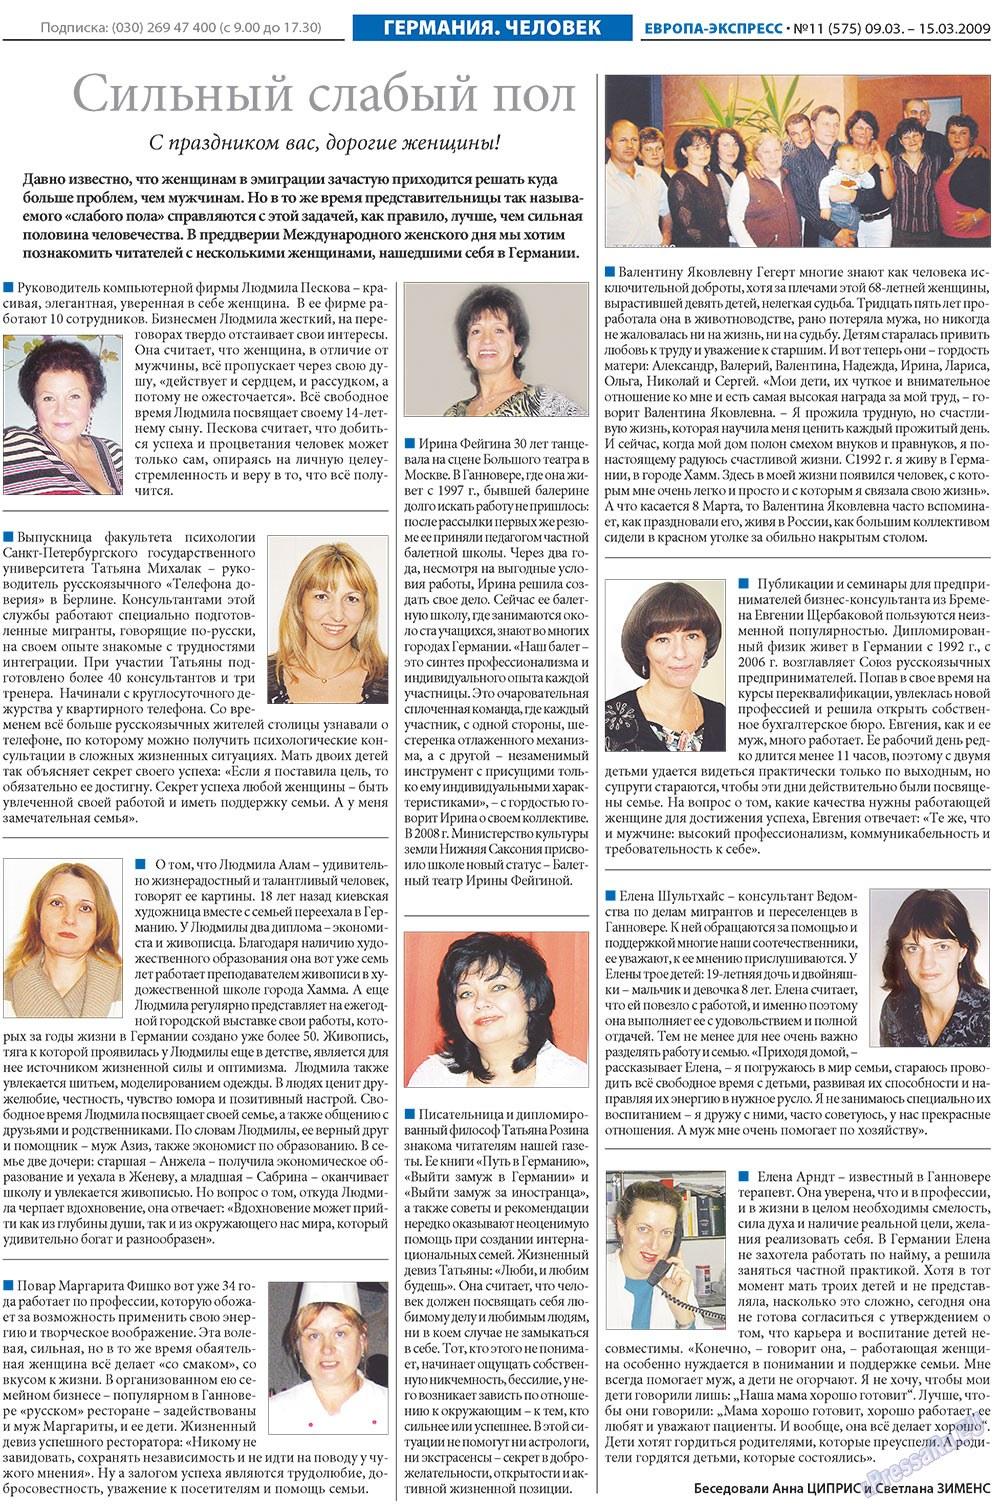 Европа экспресс (газета). 2009 год, номер 11, стр. 4